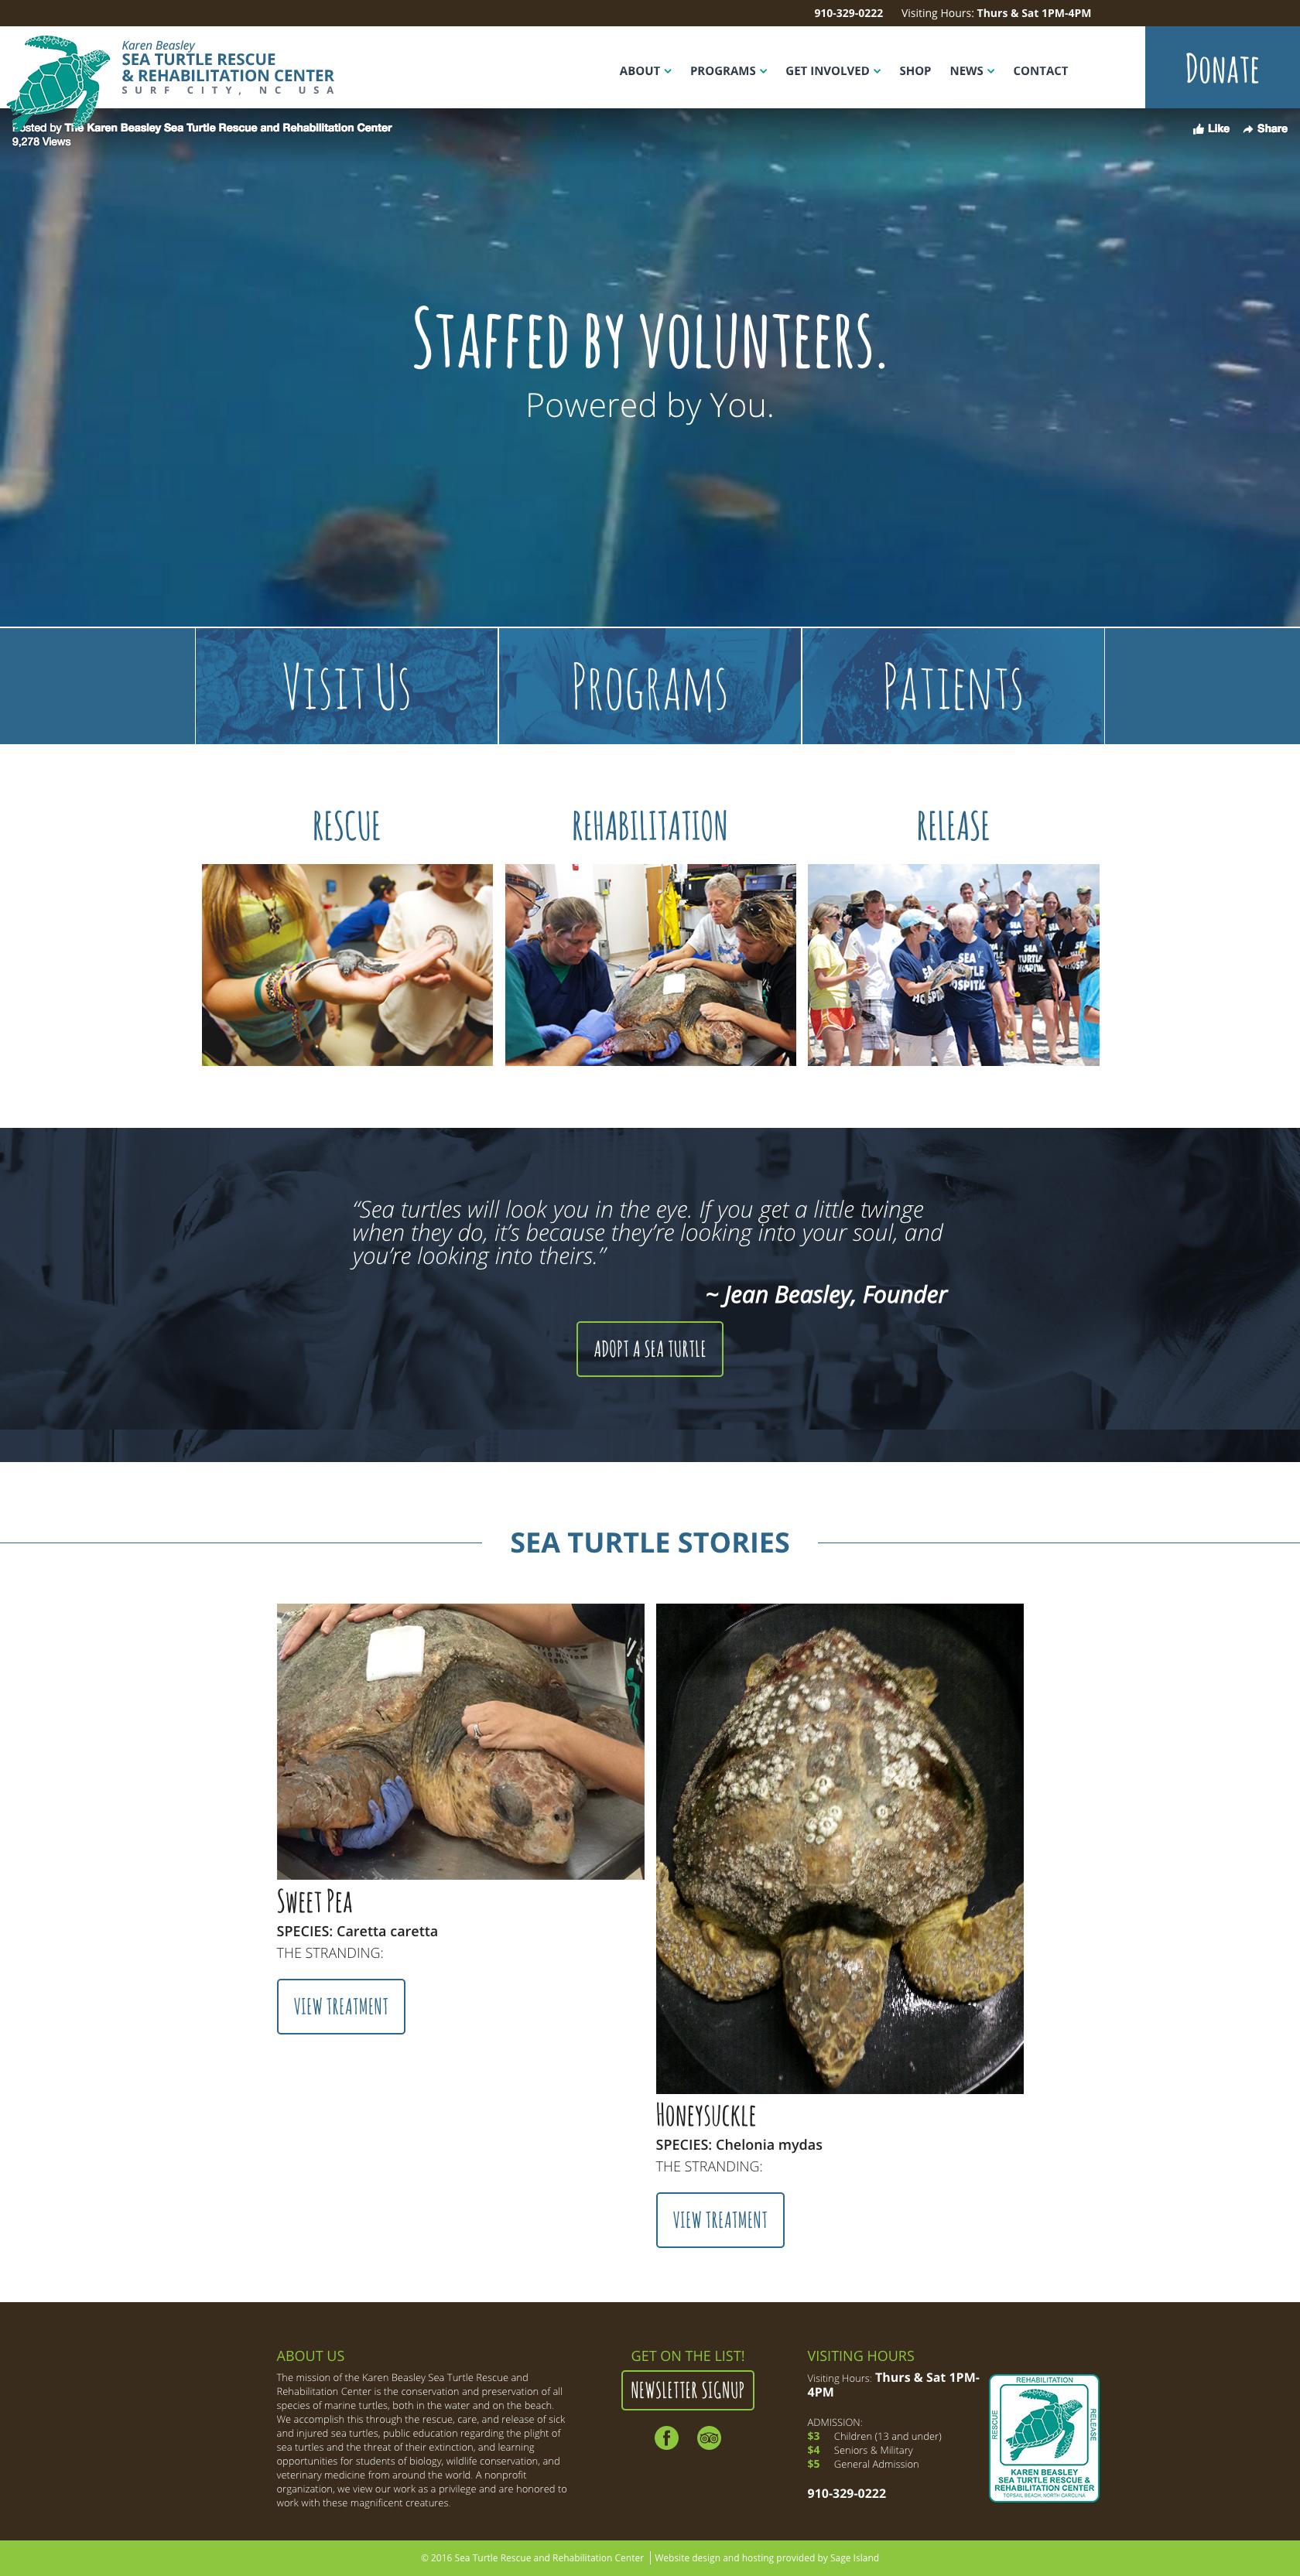 karen-beasley-sea-turtle-hospital-website-design